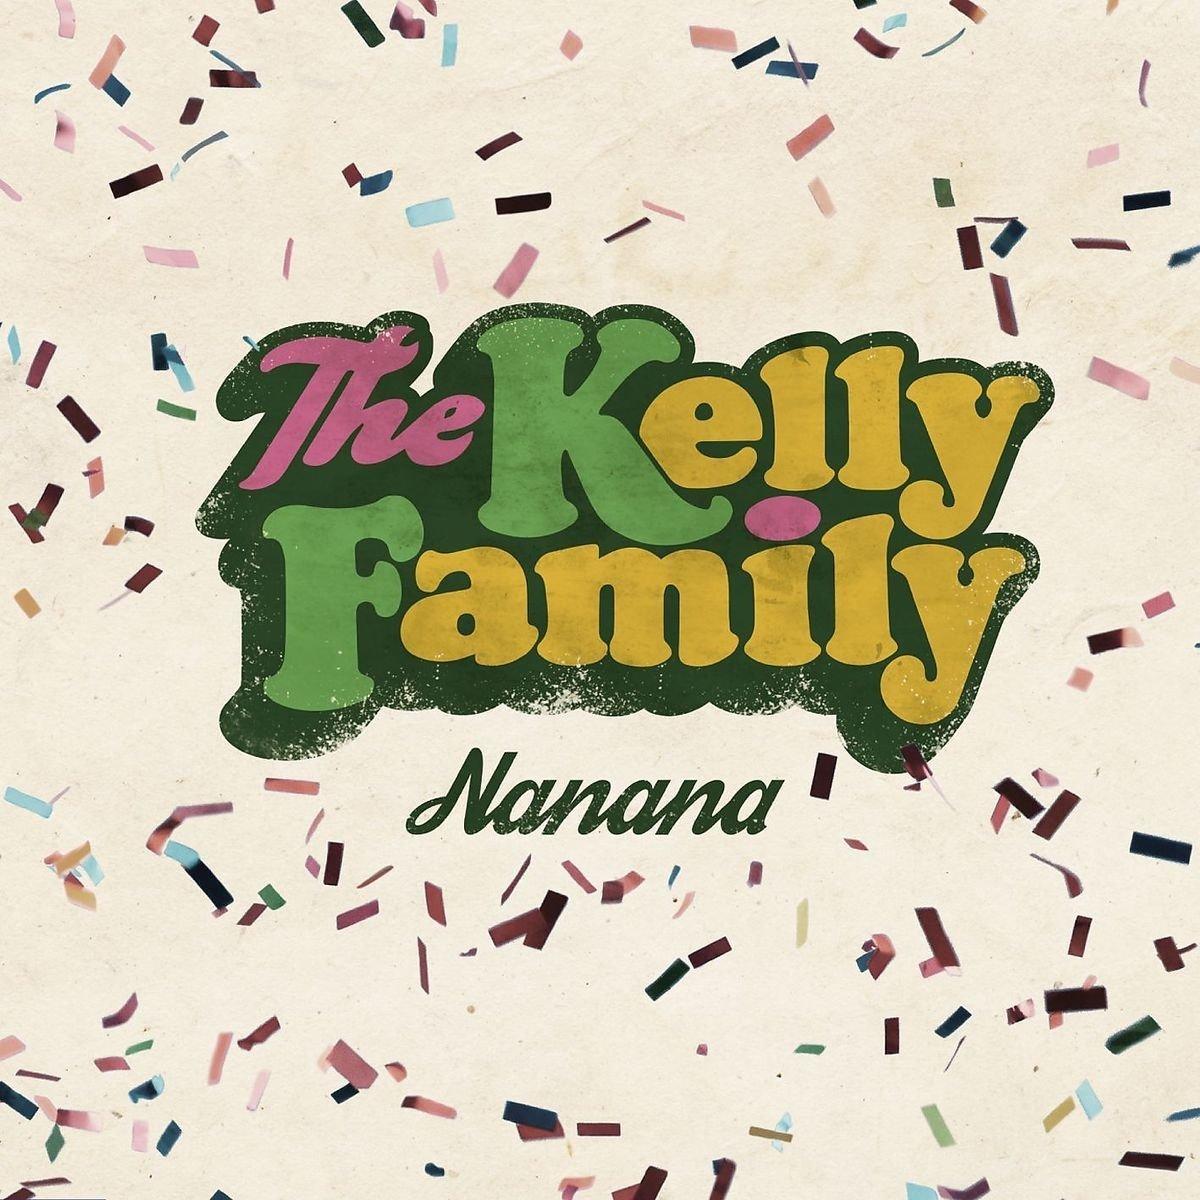 "kelly family nanana  - Kelly Family: Video zu ""Nanana"" ab sofort online"